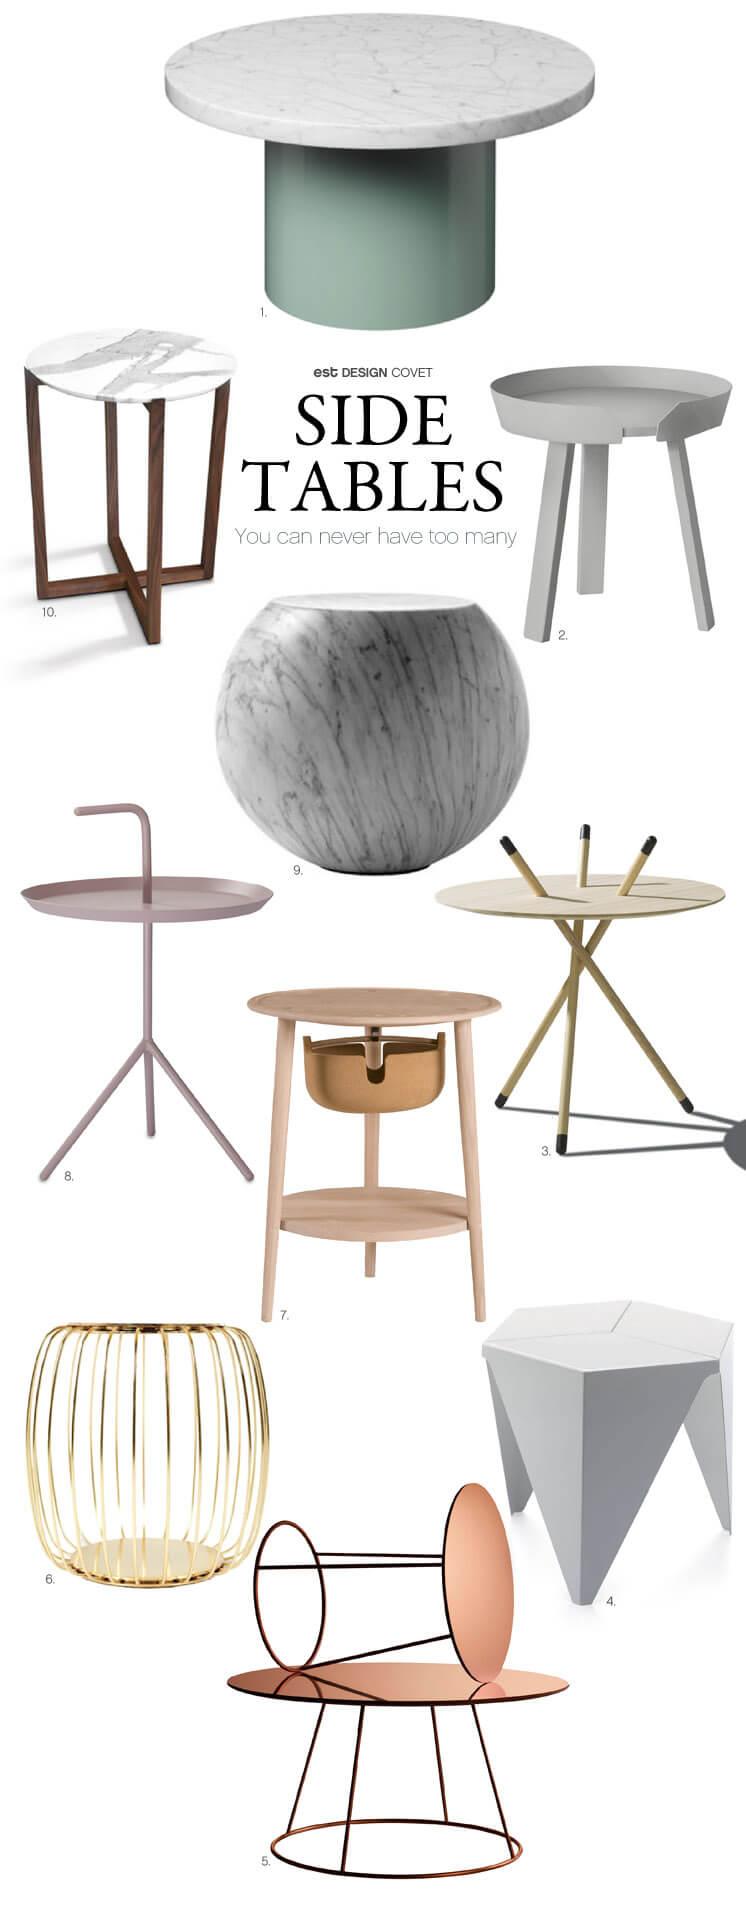 Side Tables Design Covet Sophie Carr Est Magazine